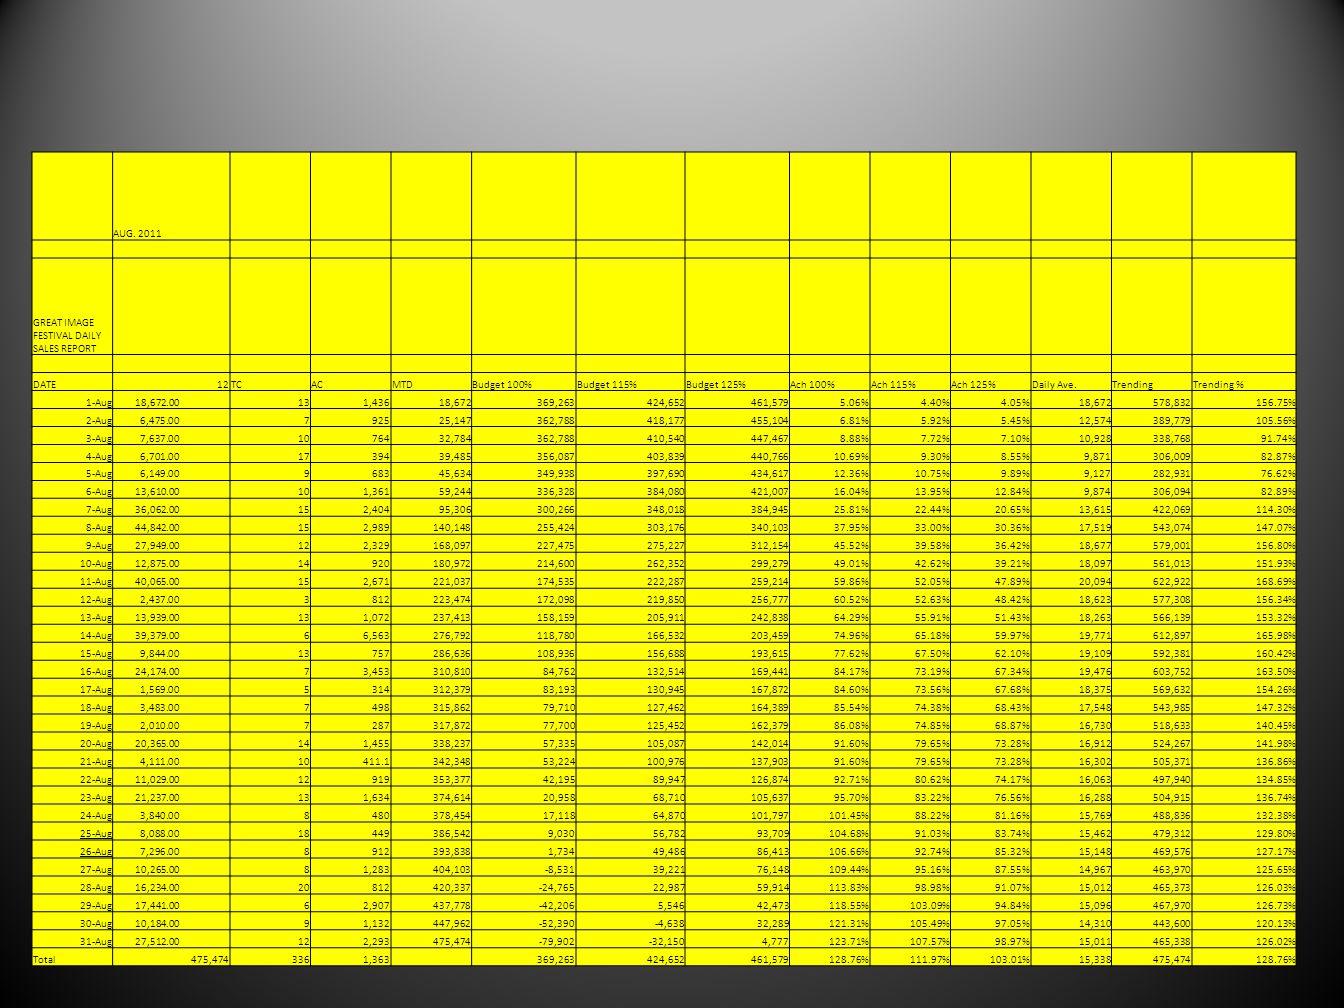 AUG. 2011 GREAT IMAGE FESTIVAL DAILY SALES REPORT DATE12TCACMTDBudget 100%Budget 115%Budget 125%Ach 100%Ach 115%Ach 125%Daily Ave.TrendingTrending % 1